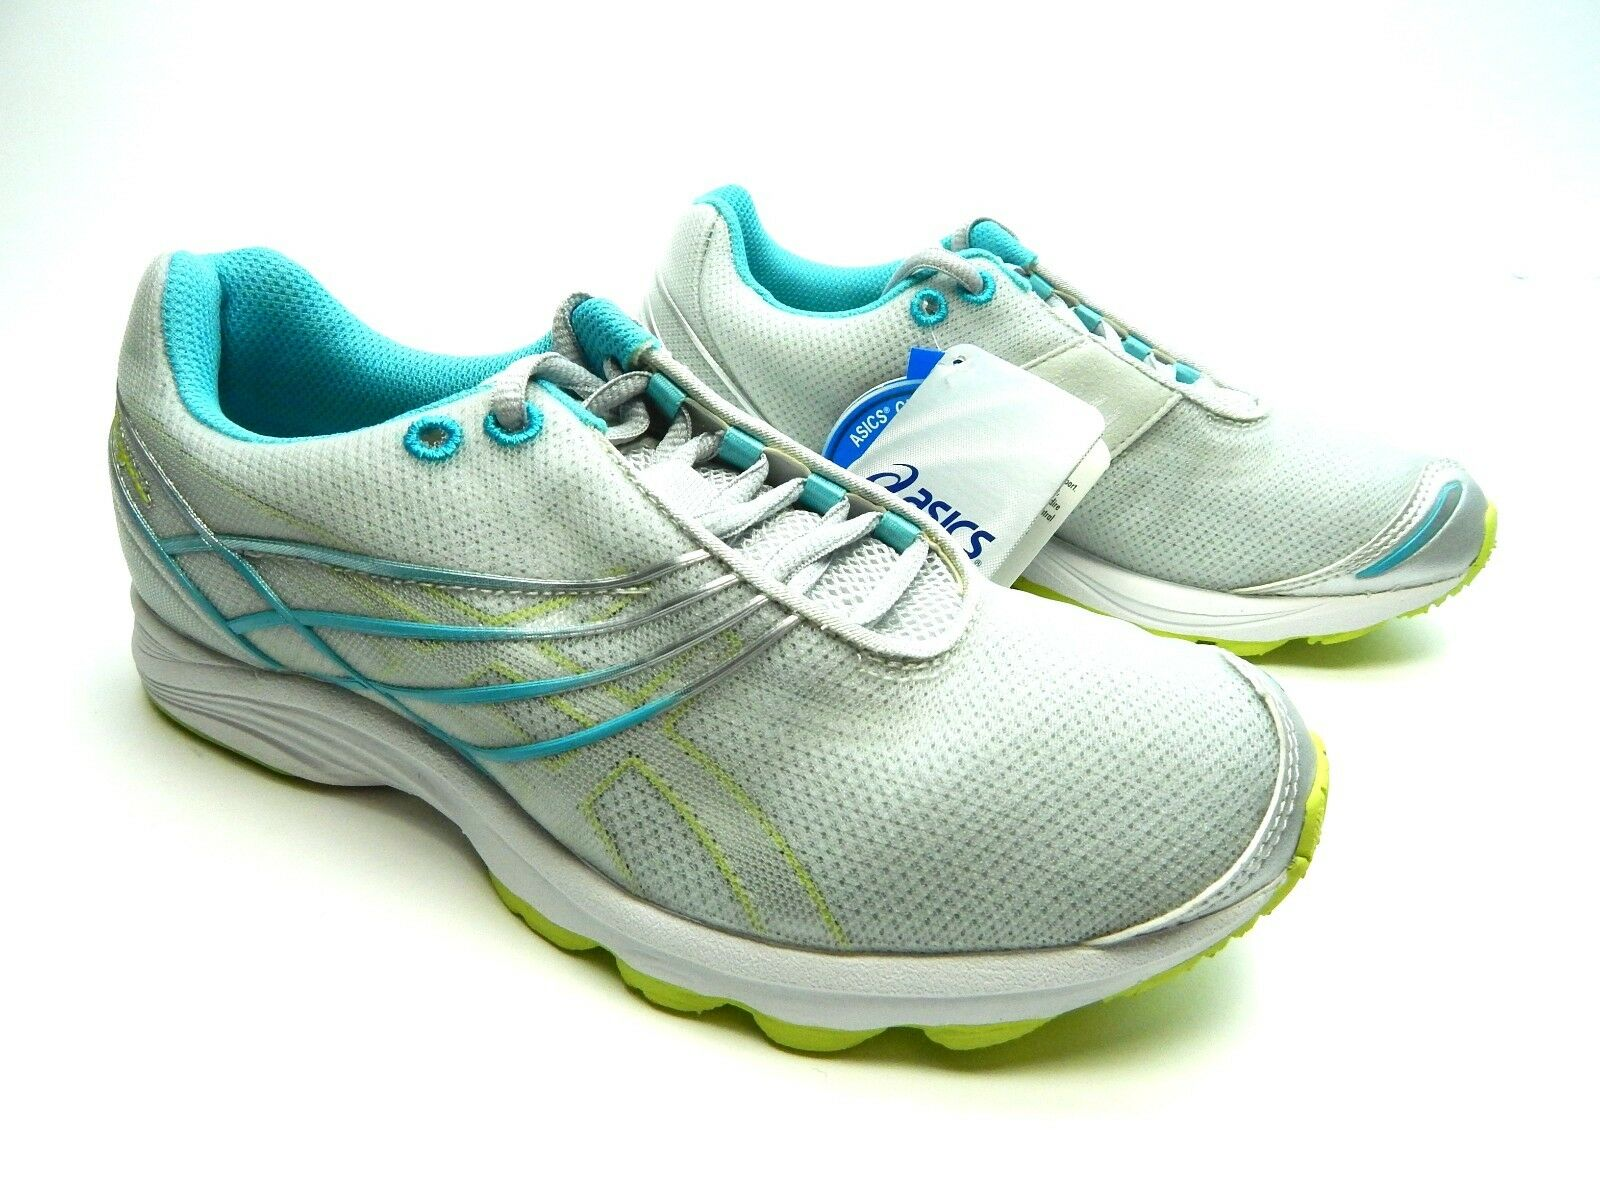 ASICS GEL PLATINUM SAYURI T172N 9291 SILVER PLATINUM GEL WOMEN Schuhe SIZE 6 77ed39